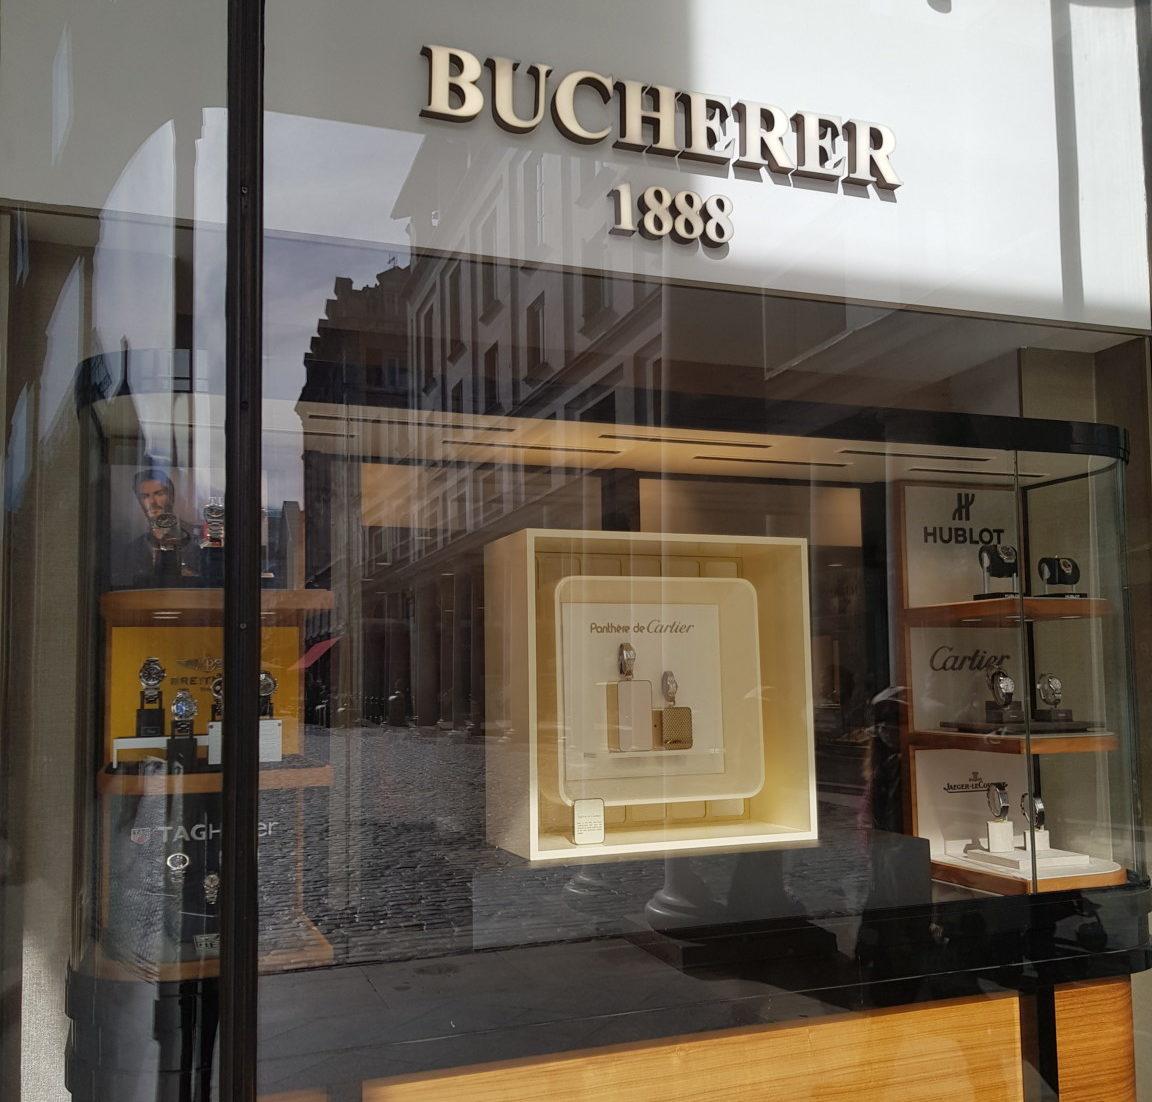 The Bucherer UK boutique in Covent Garden.